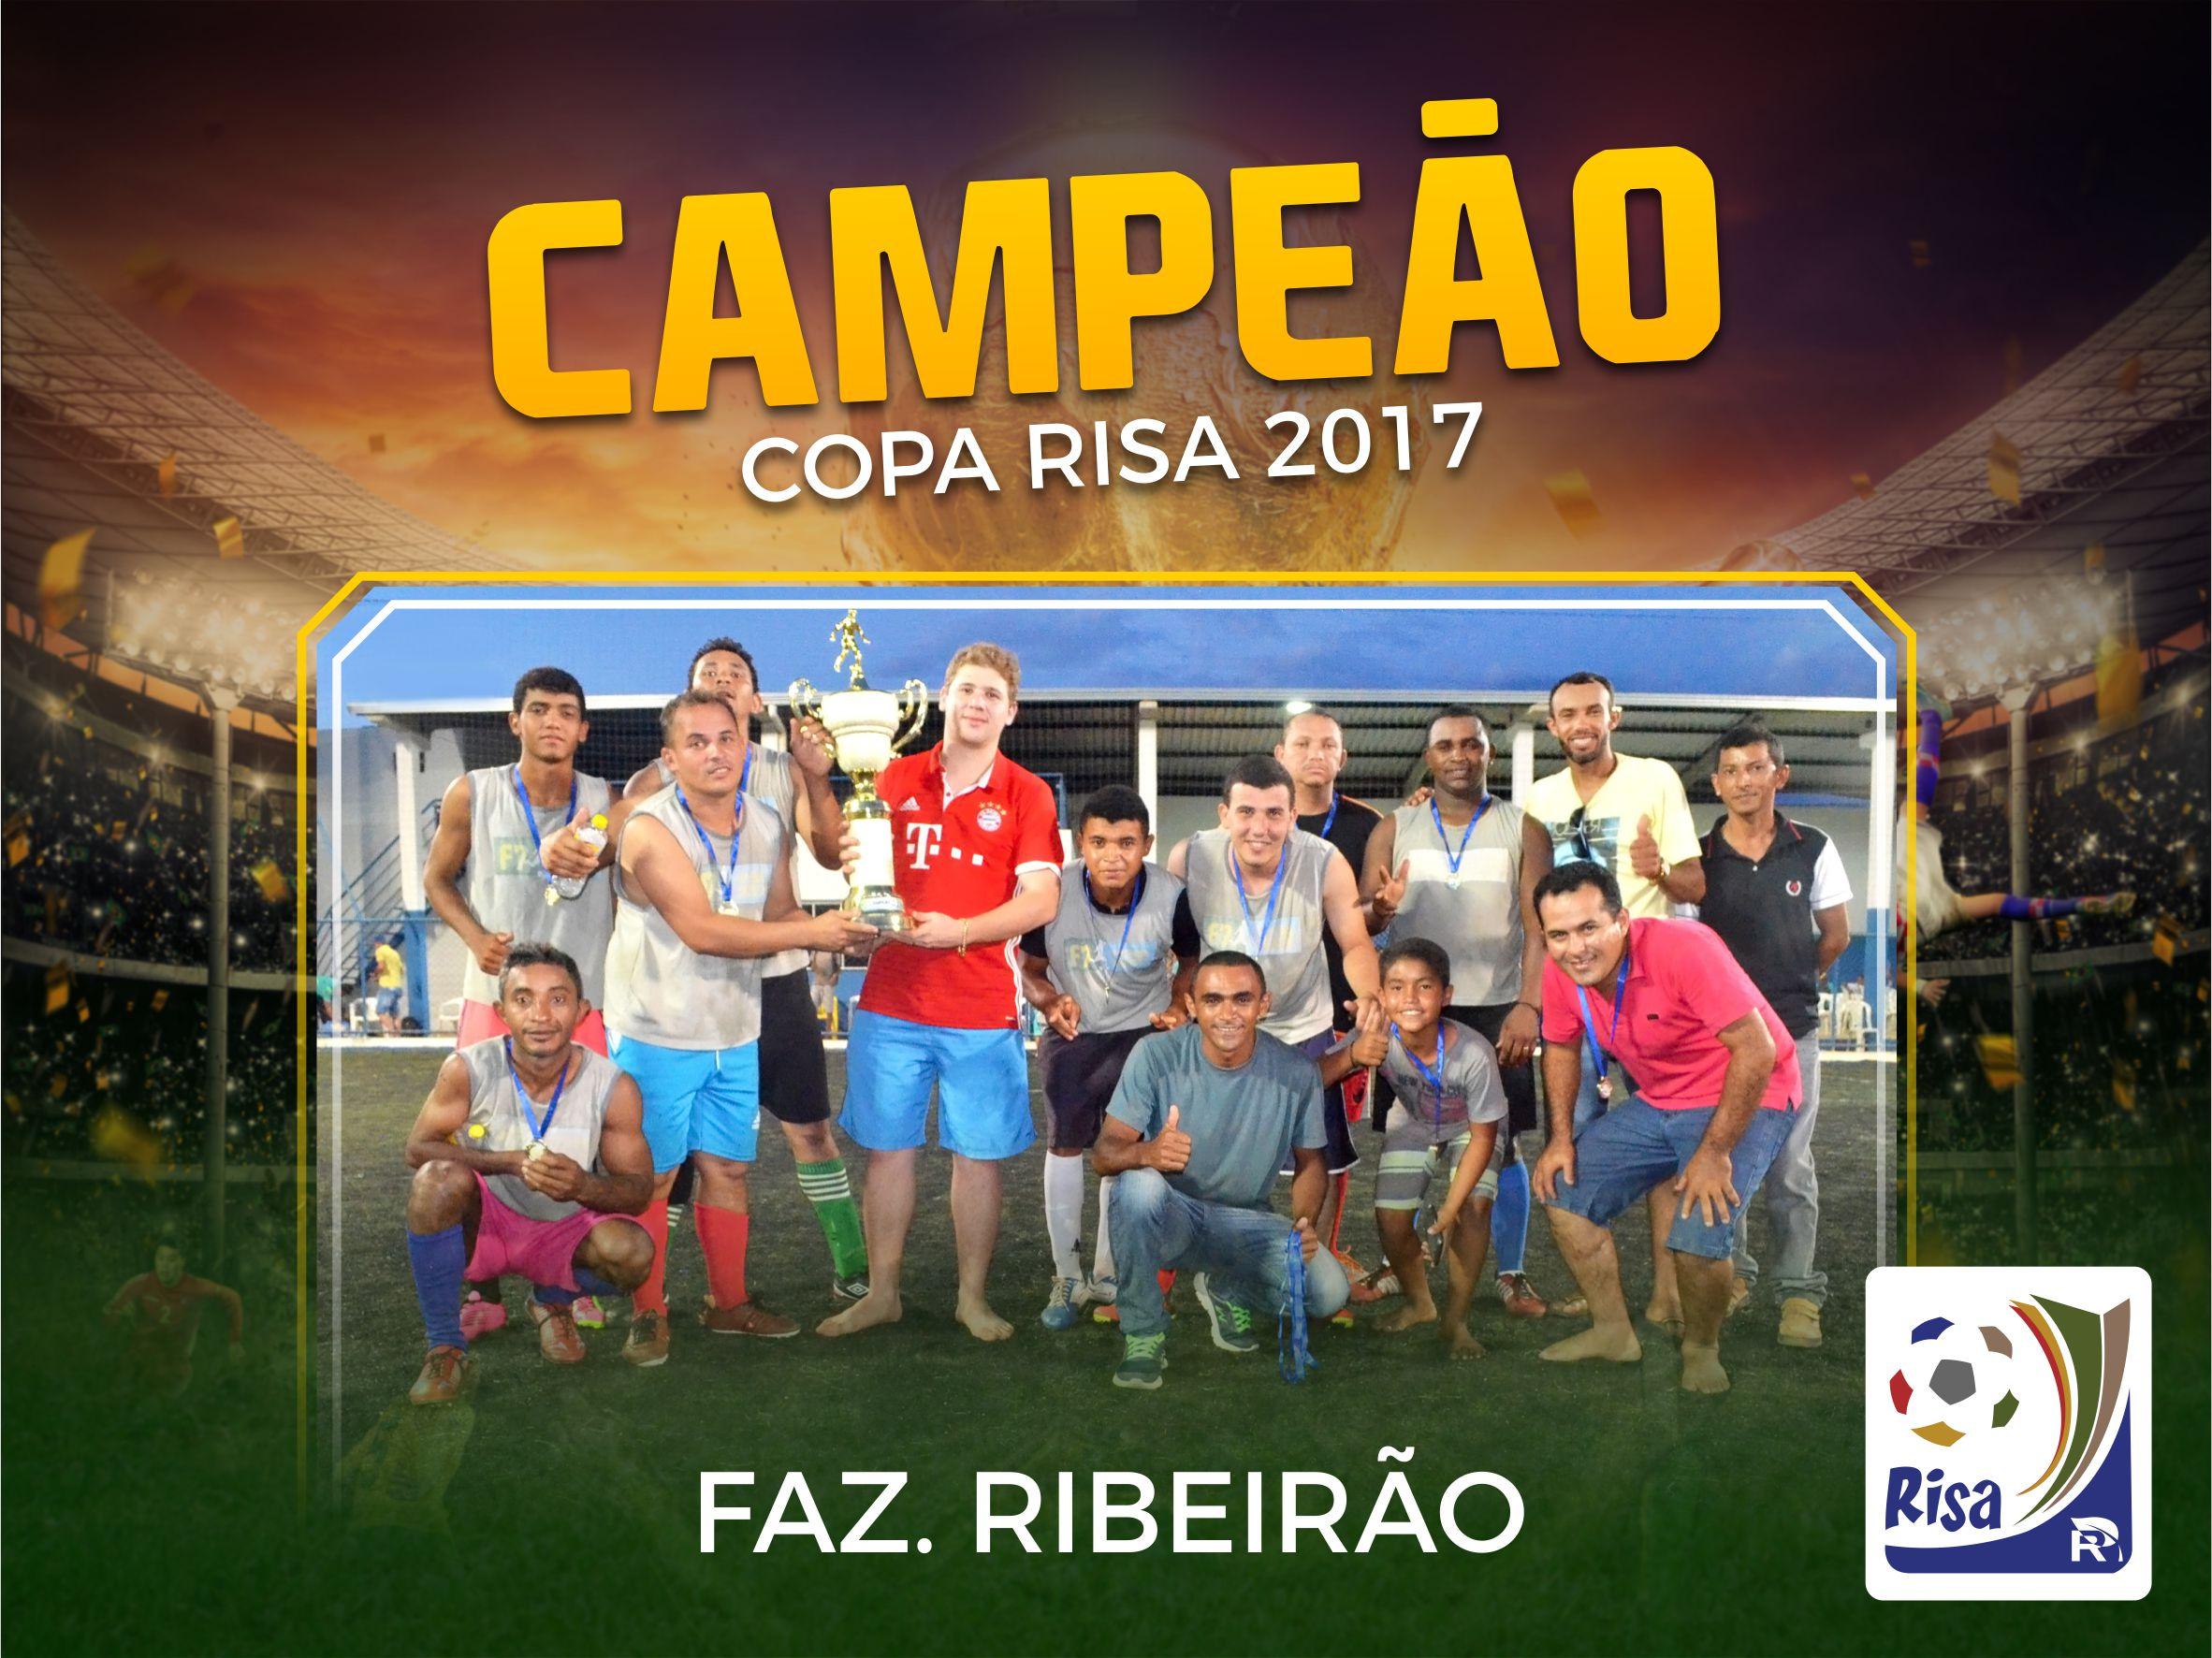 campeao - bf